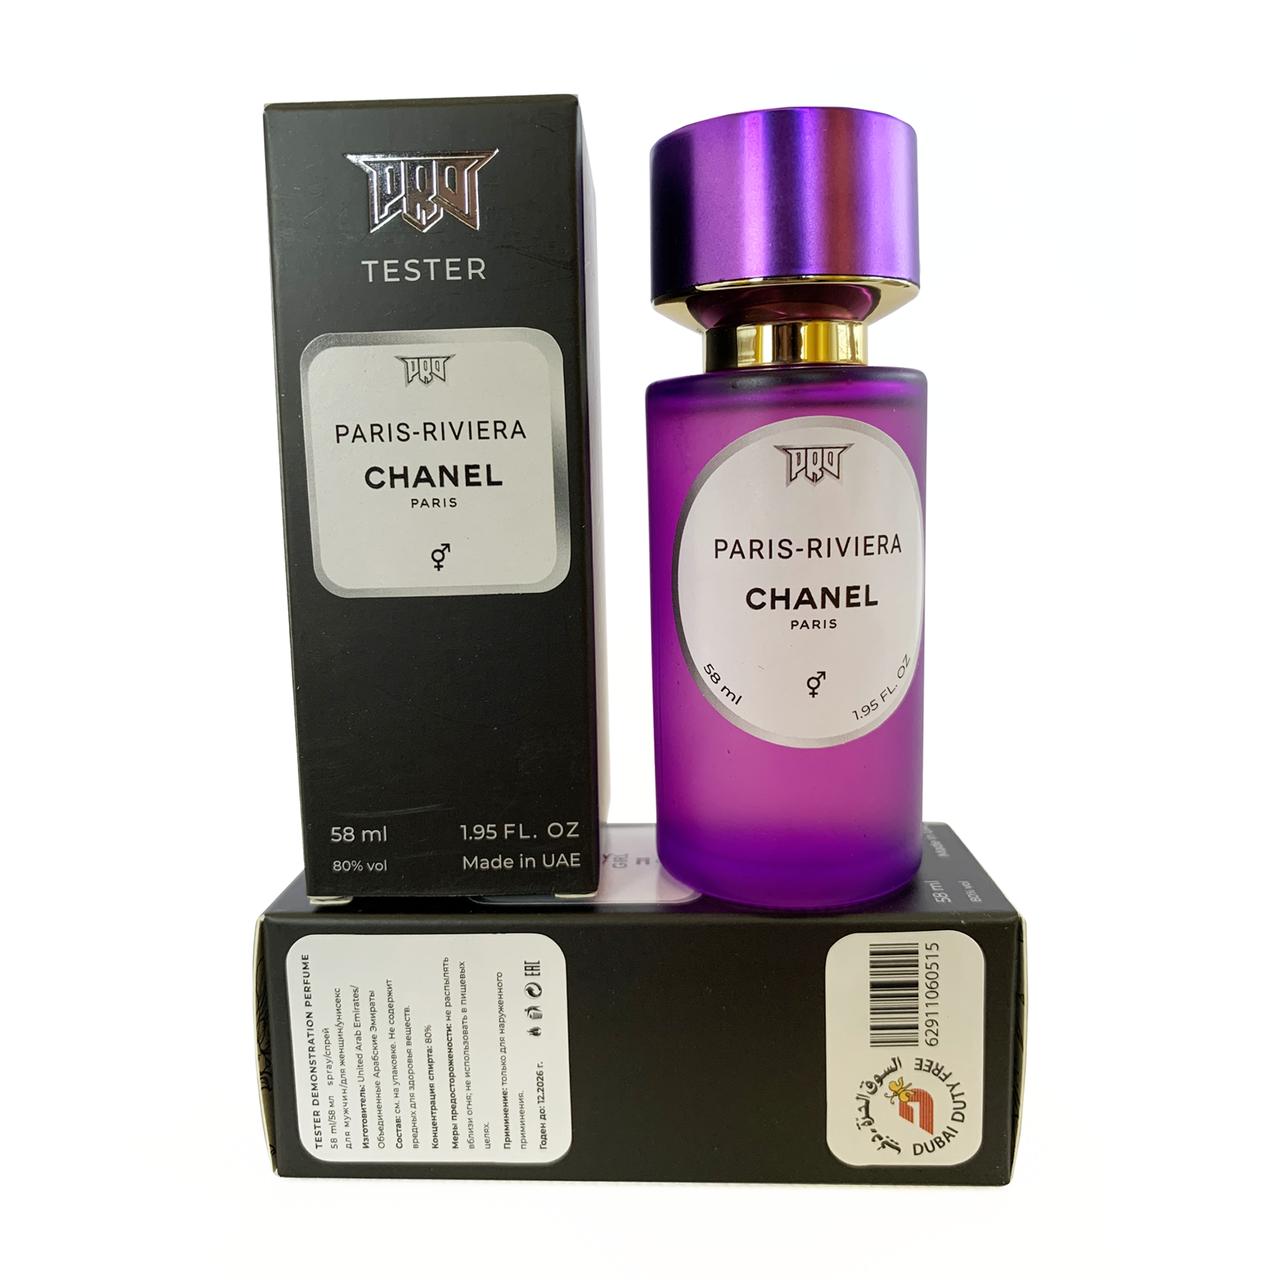 Chanel Paris-Riviera 58 мл, унисекс